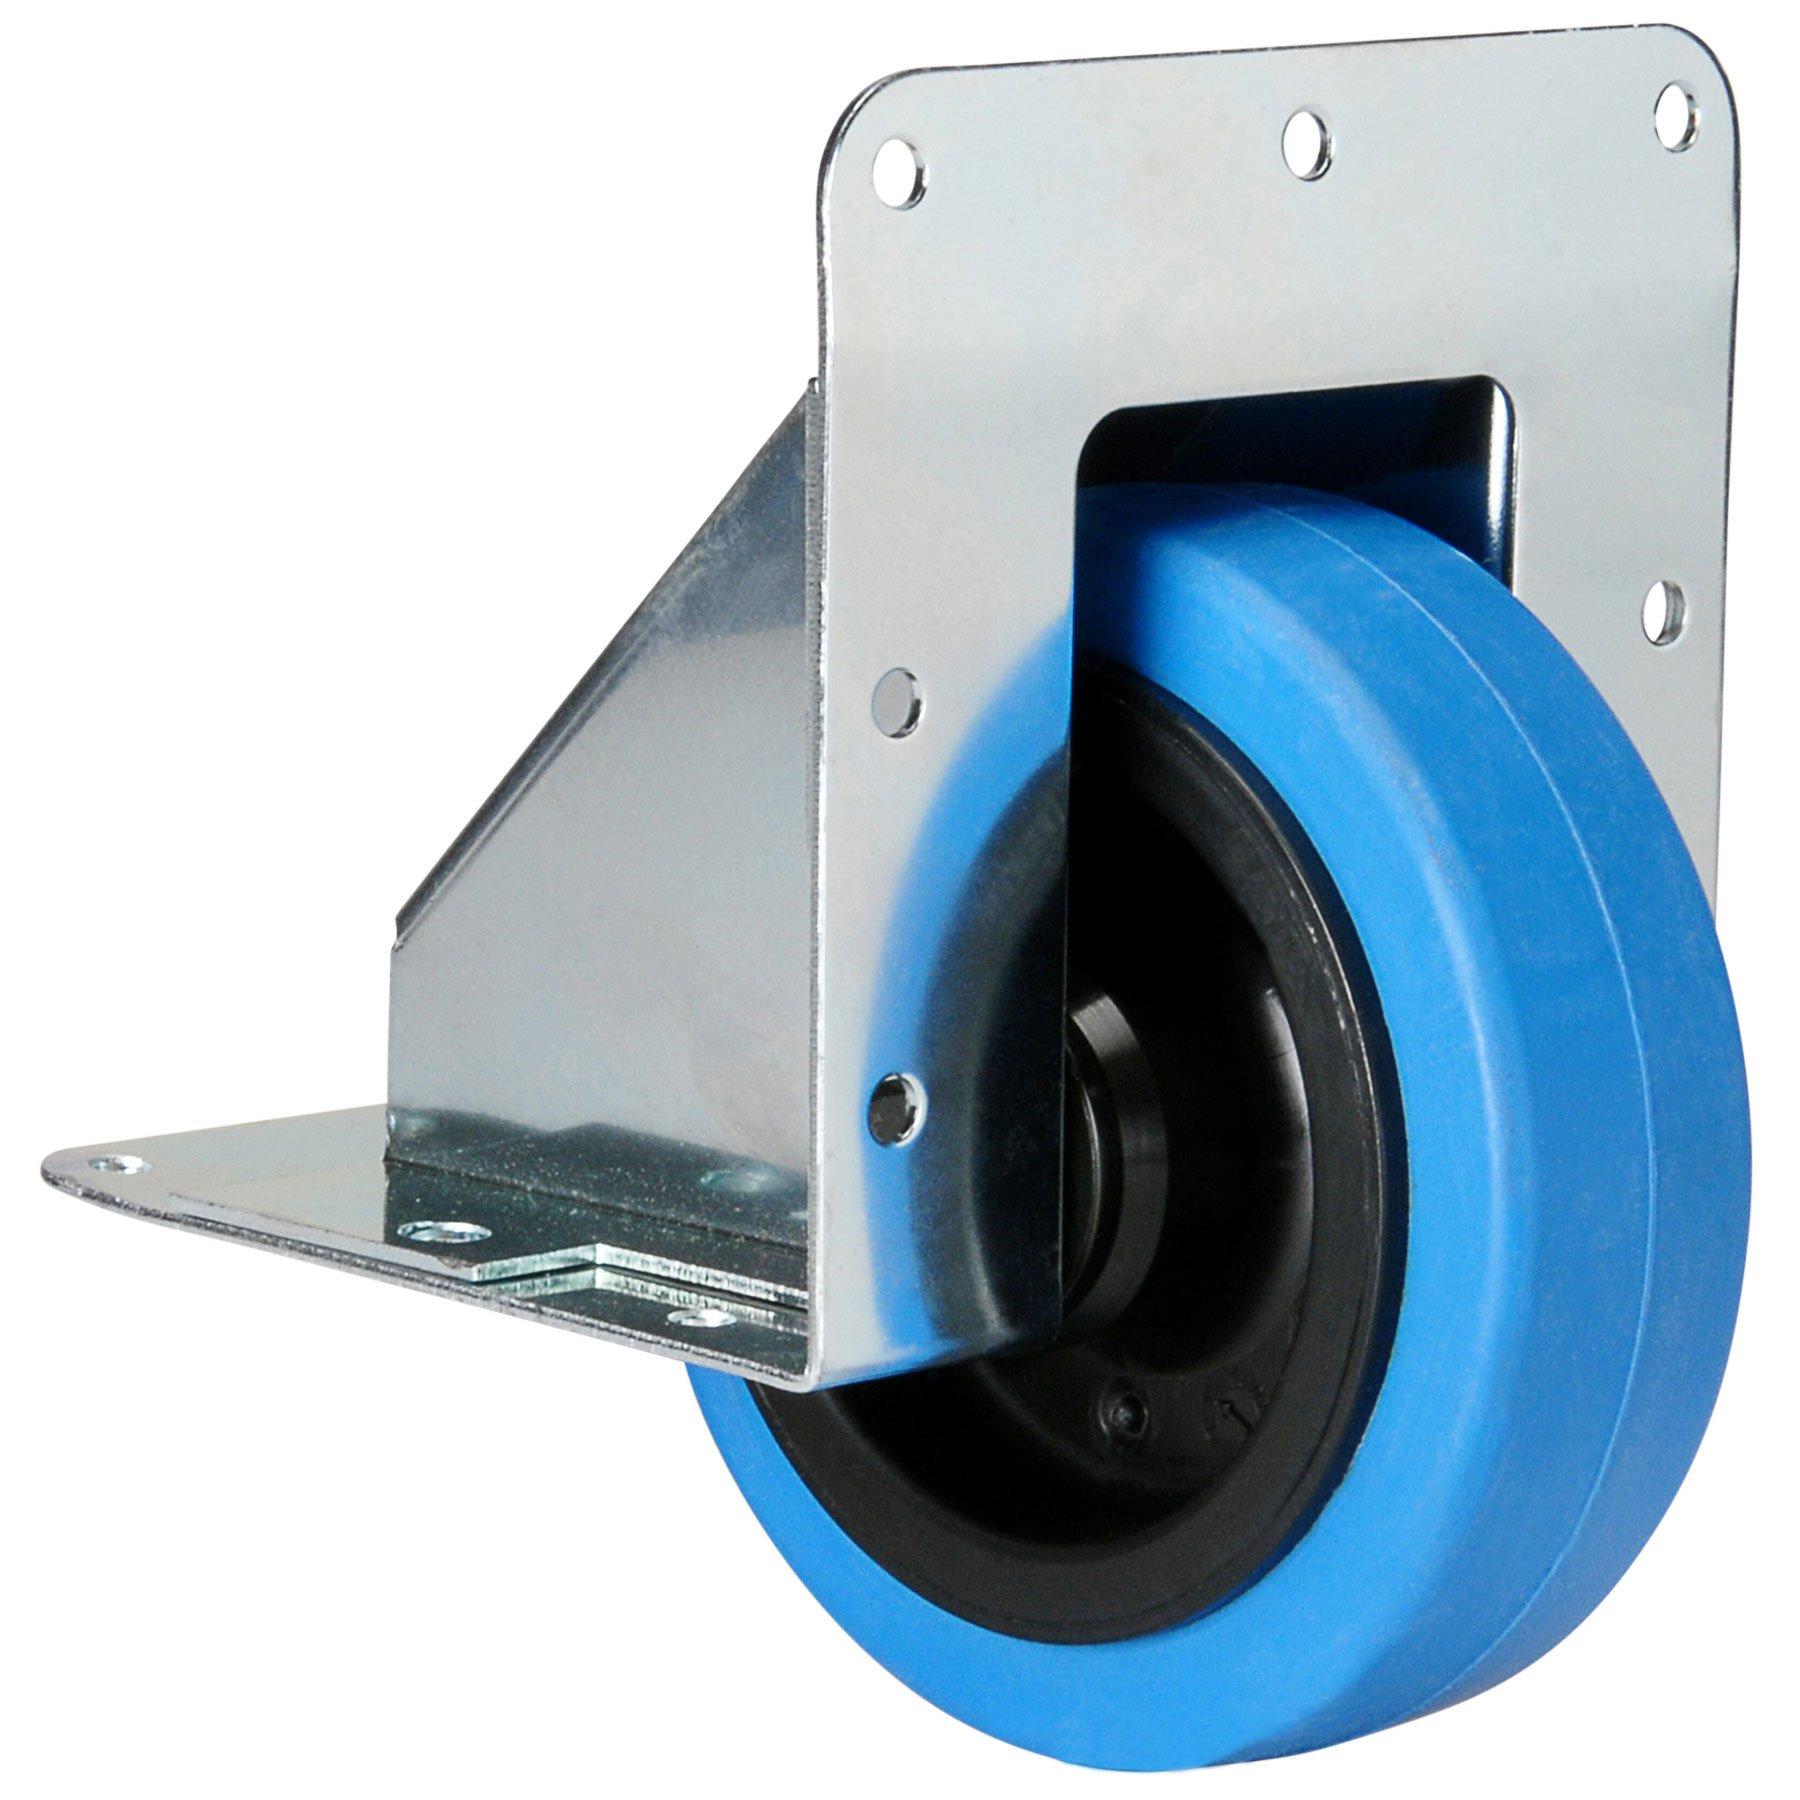 Penn-Elcom W2100 4'' Recessed Caster w/Blue Wheel 330 lb.